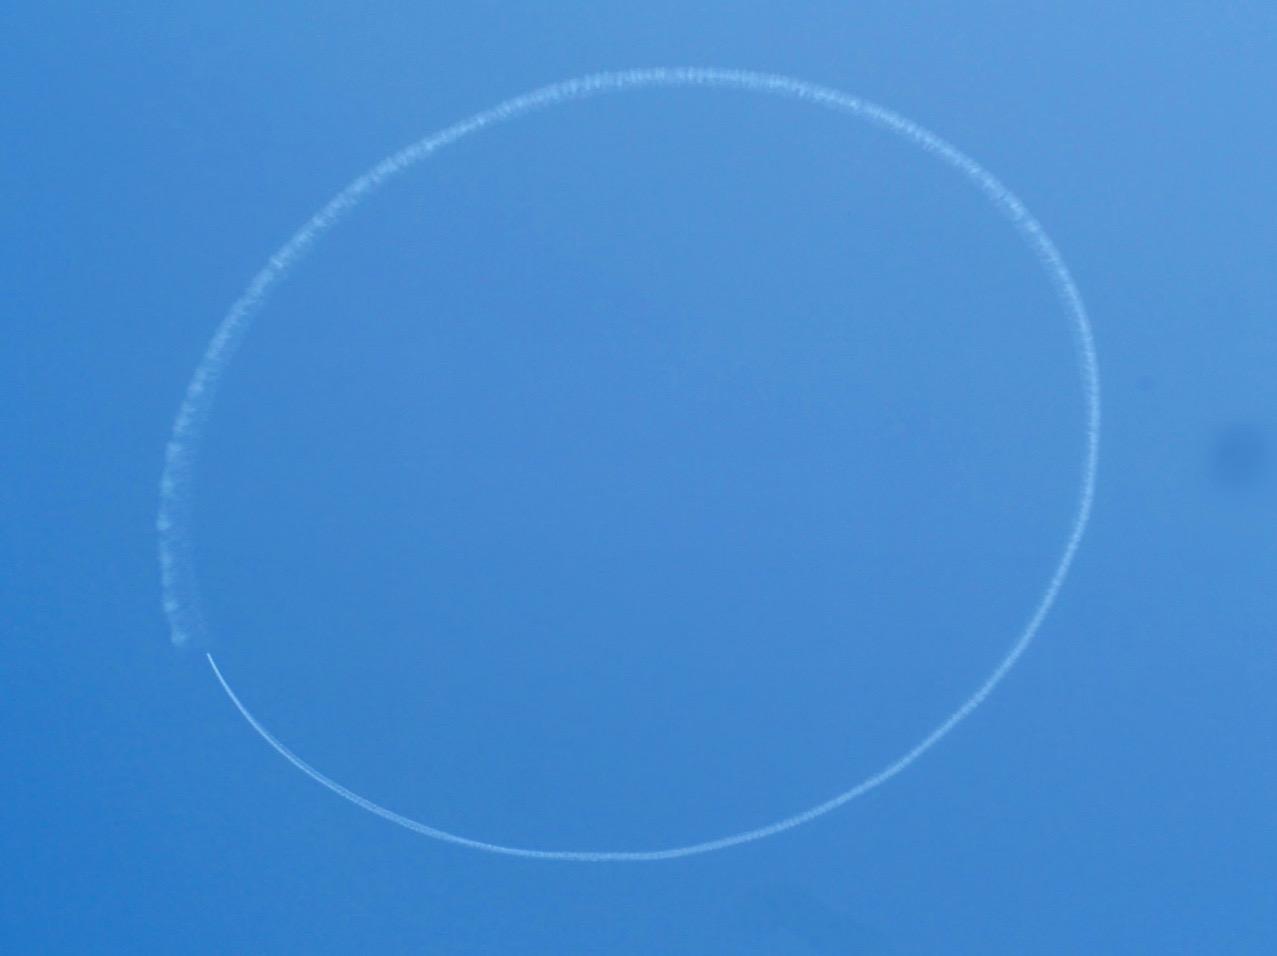 【Fly for ALL #大空を見上げよう】東京の空にニコちゃんマークが出現!一瞬の幸せをシェア☻♡_2